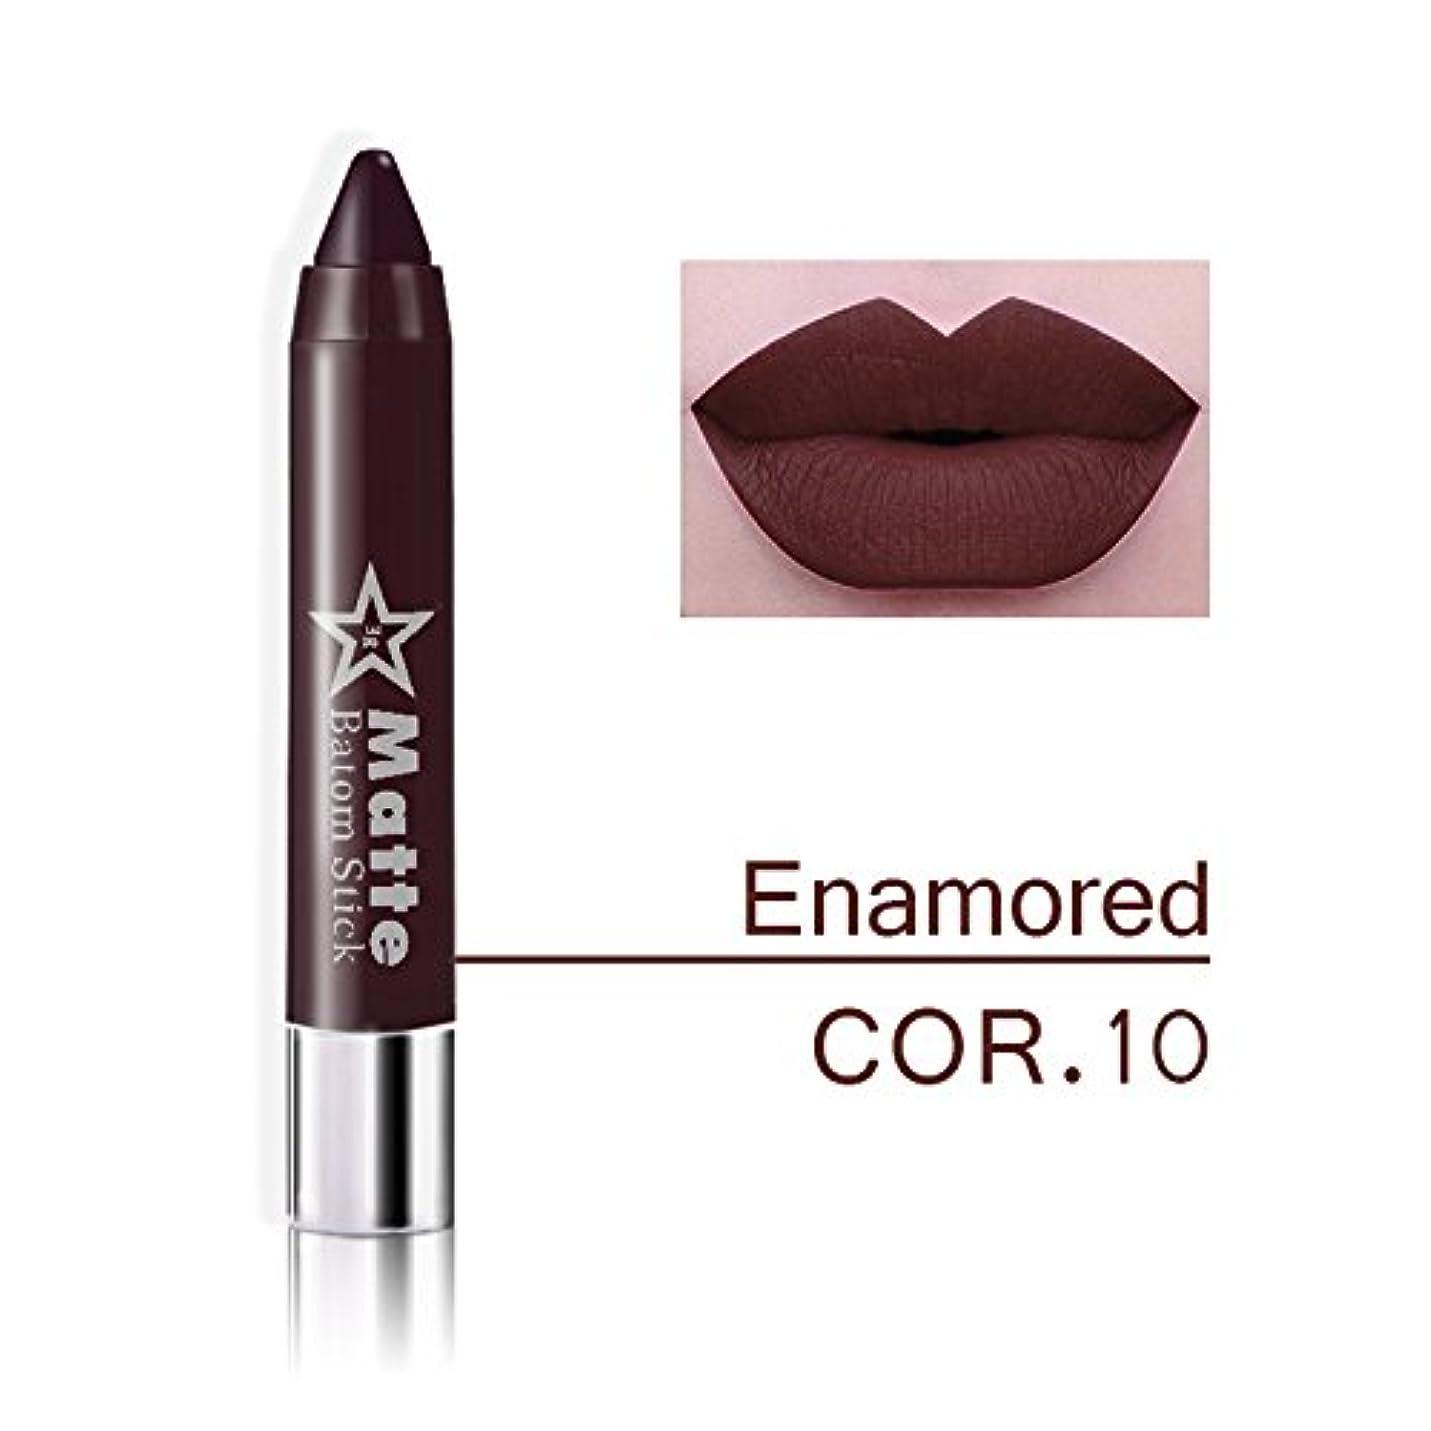 泥命令的魅惑的なMiss Rose Brand lips Matte Moisturizing Lipstick Makeup Lipsticks Waterproof matte Lip gloss Mate Lipsticks Make up